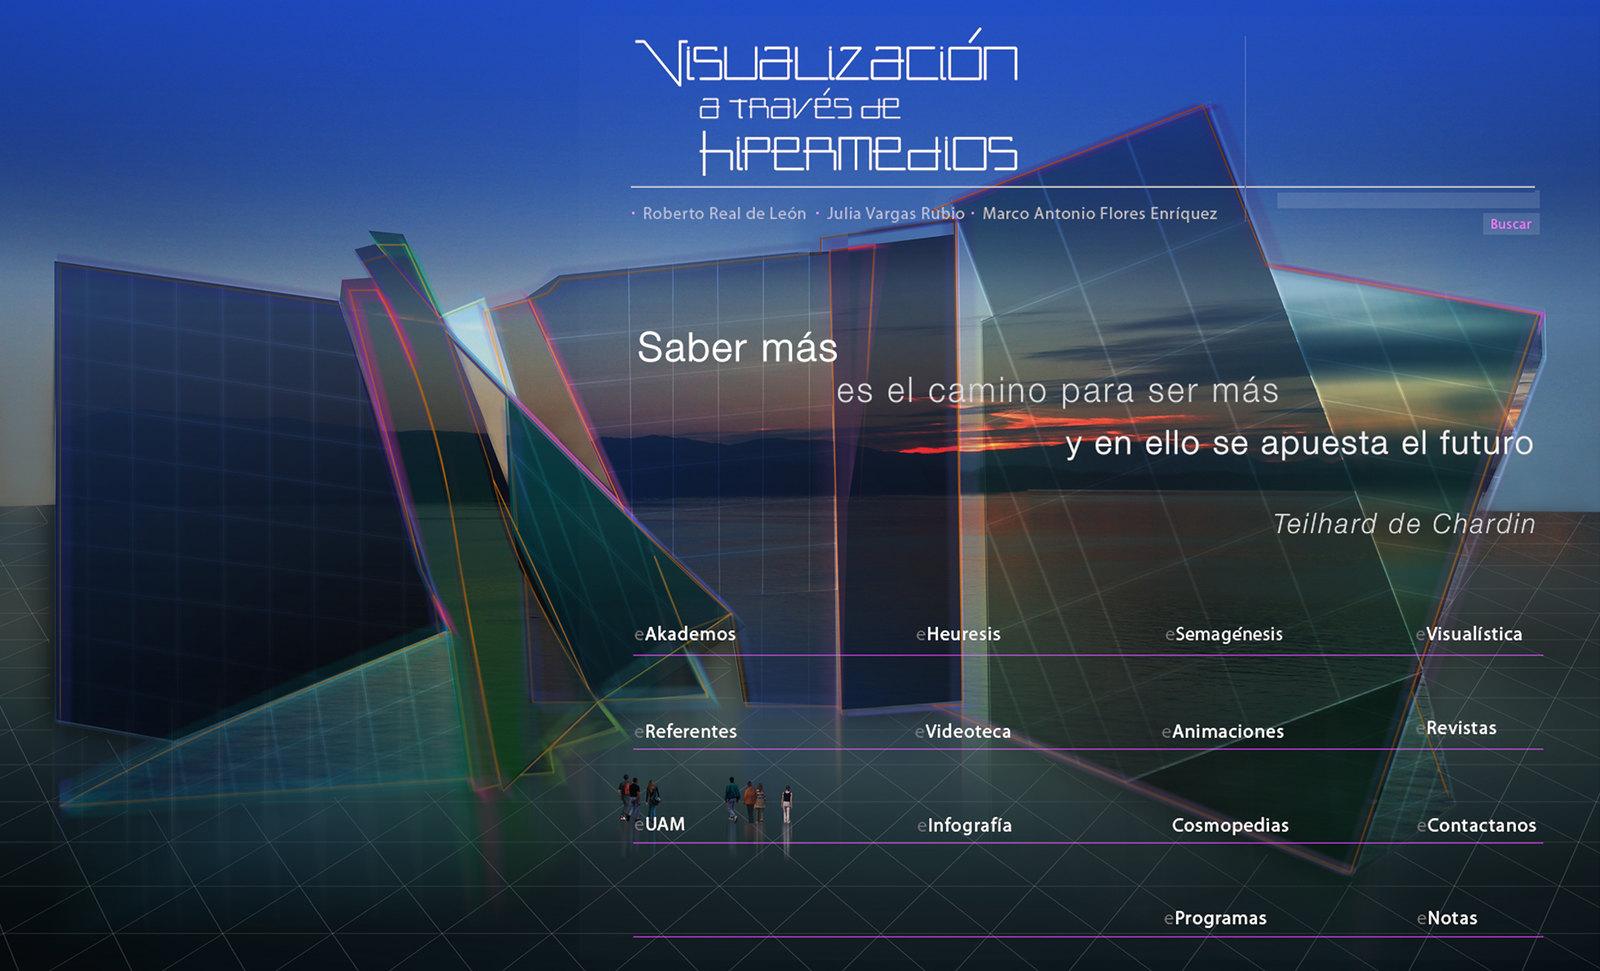 Visualización a través de Hipermedios